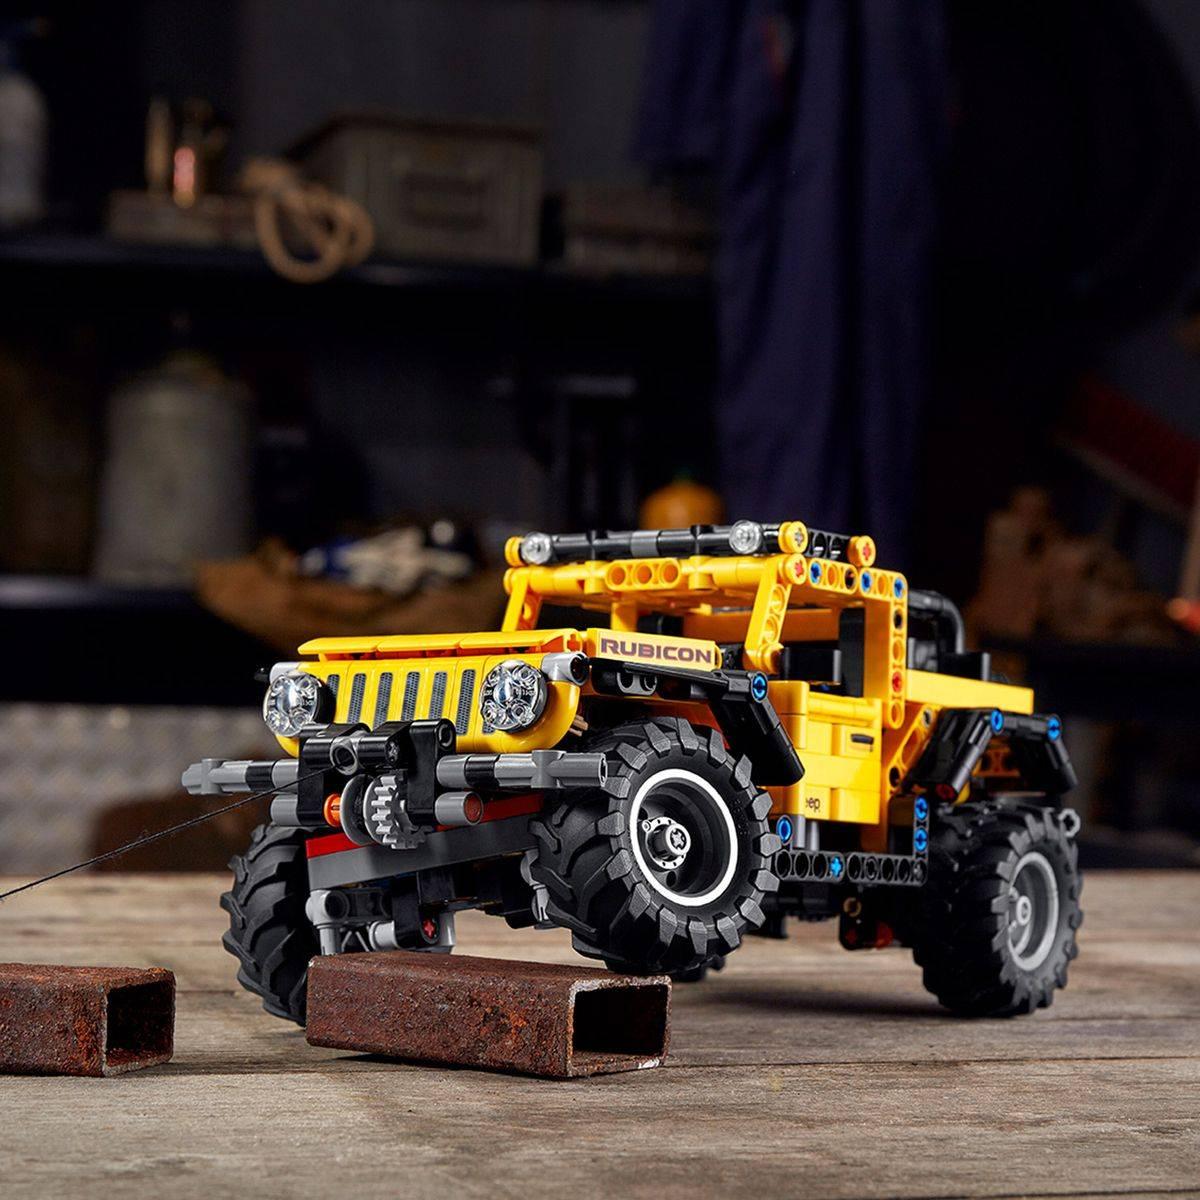 LEGO Technic Jeep Wrangler model 42122